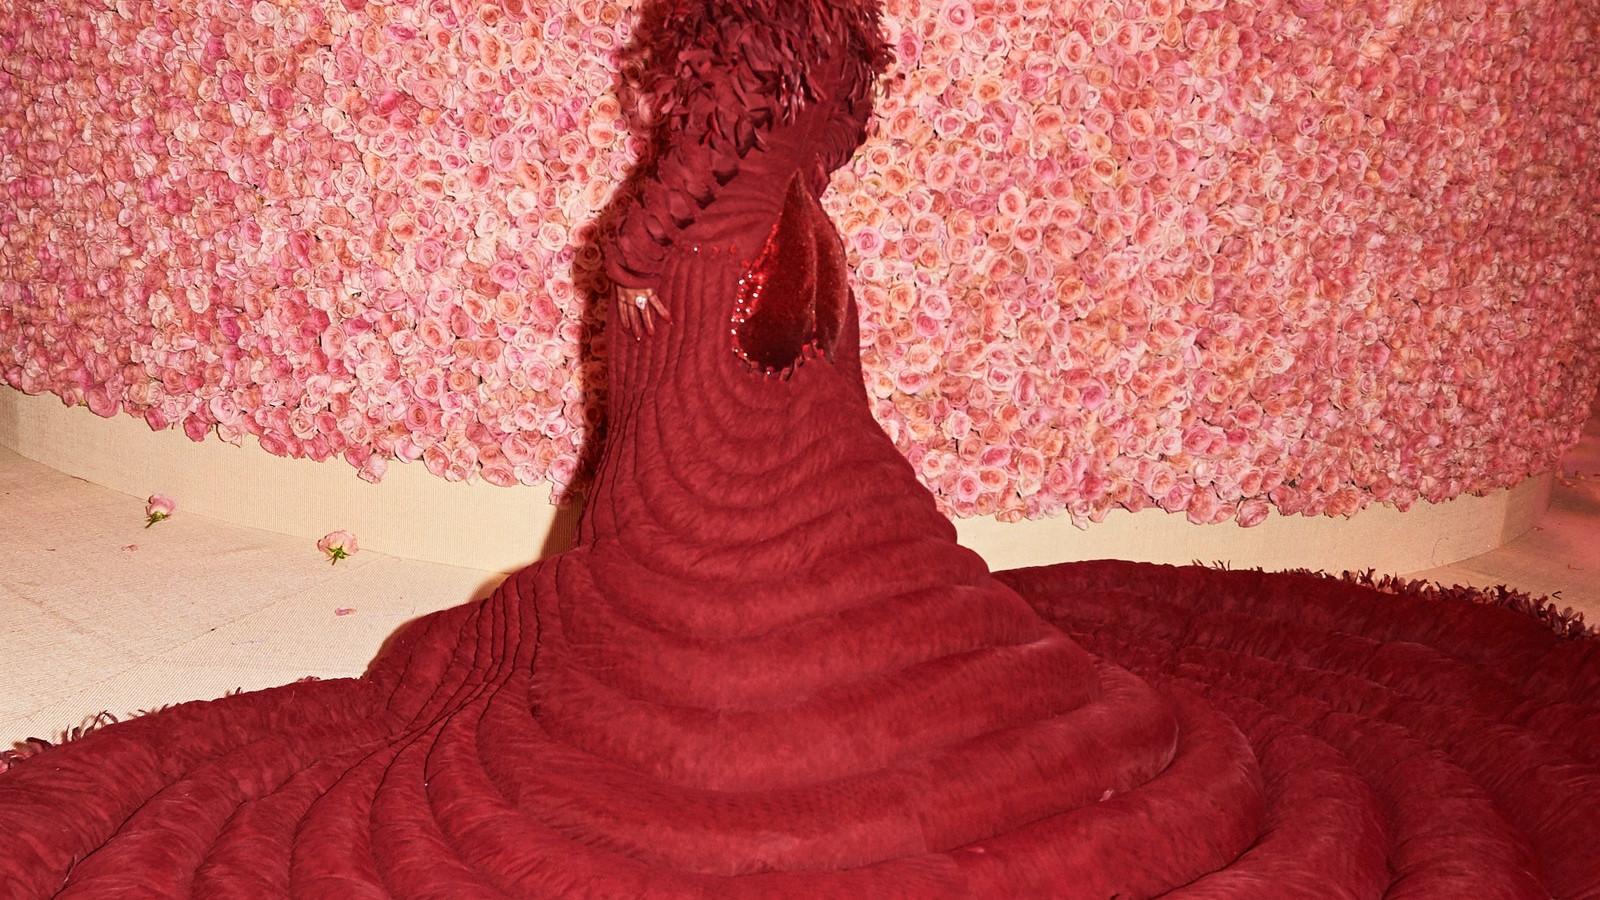 04261-HA-metgala19-Staircase - Jenae Holloway - US - Costume Institute Benefit Met Gala